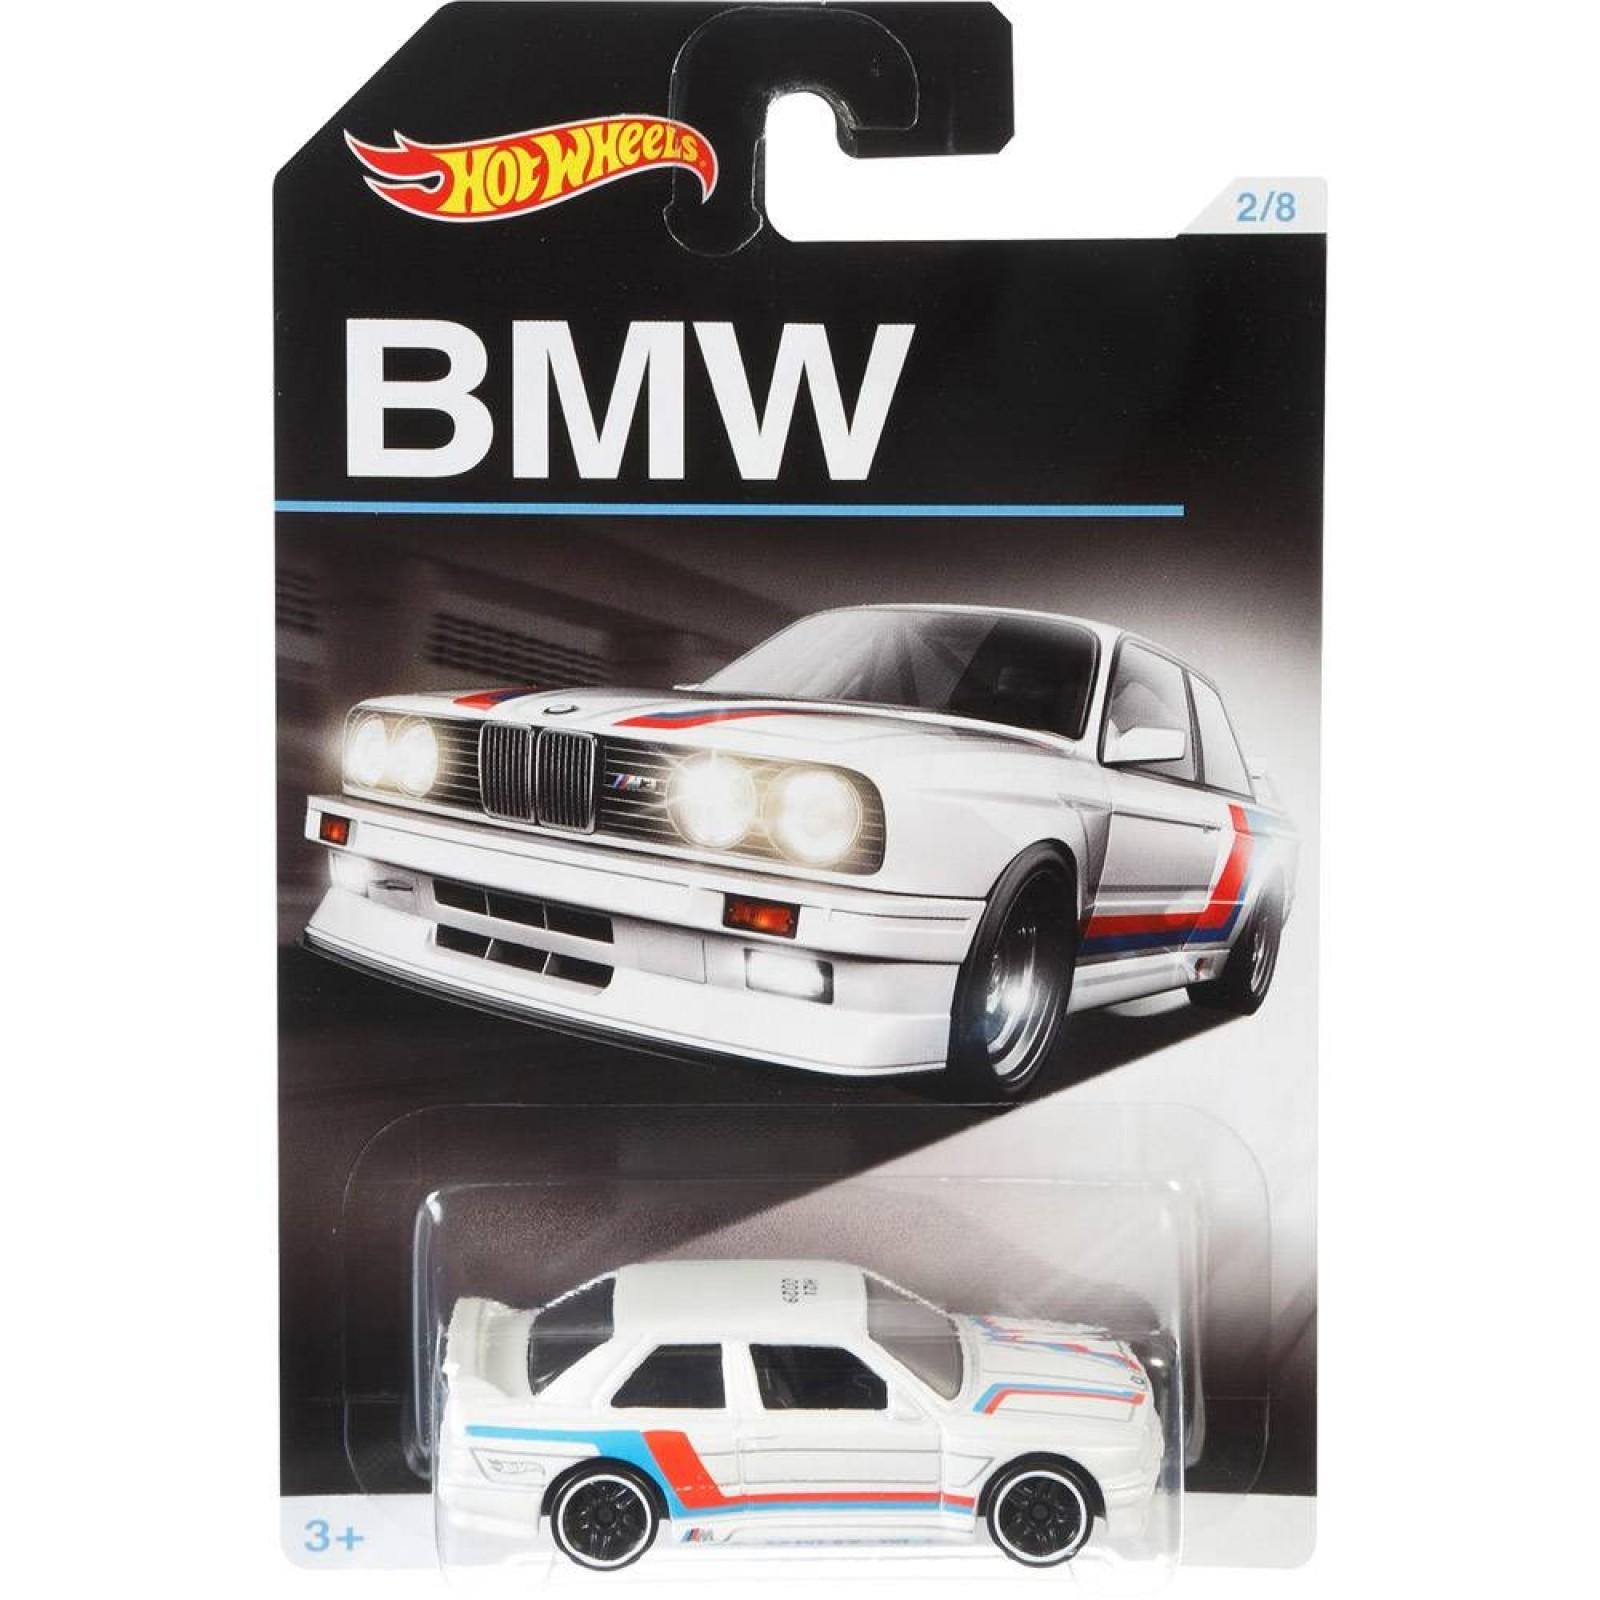 Hot Wheels - BMW 1992 M3 - DJM81